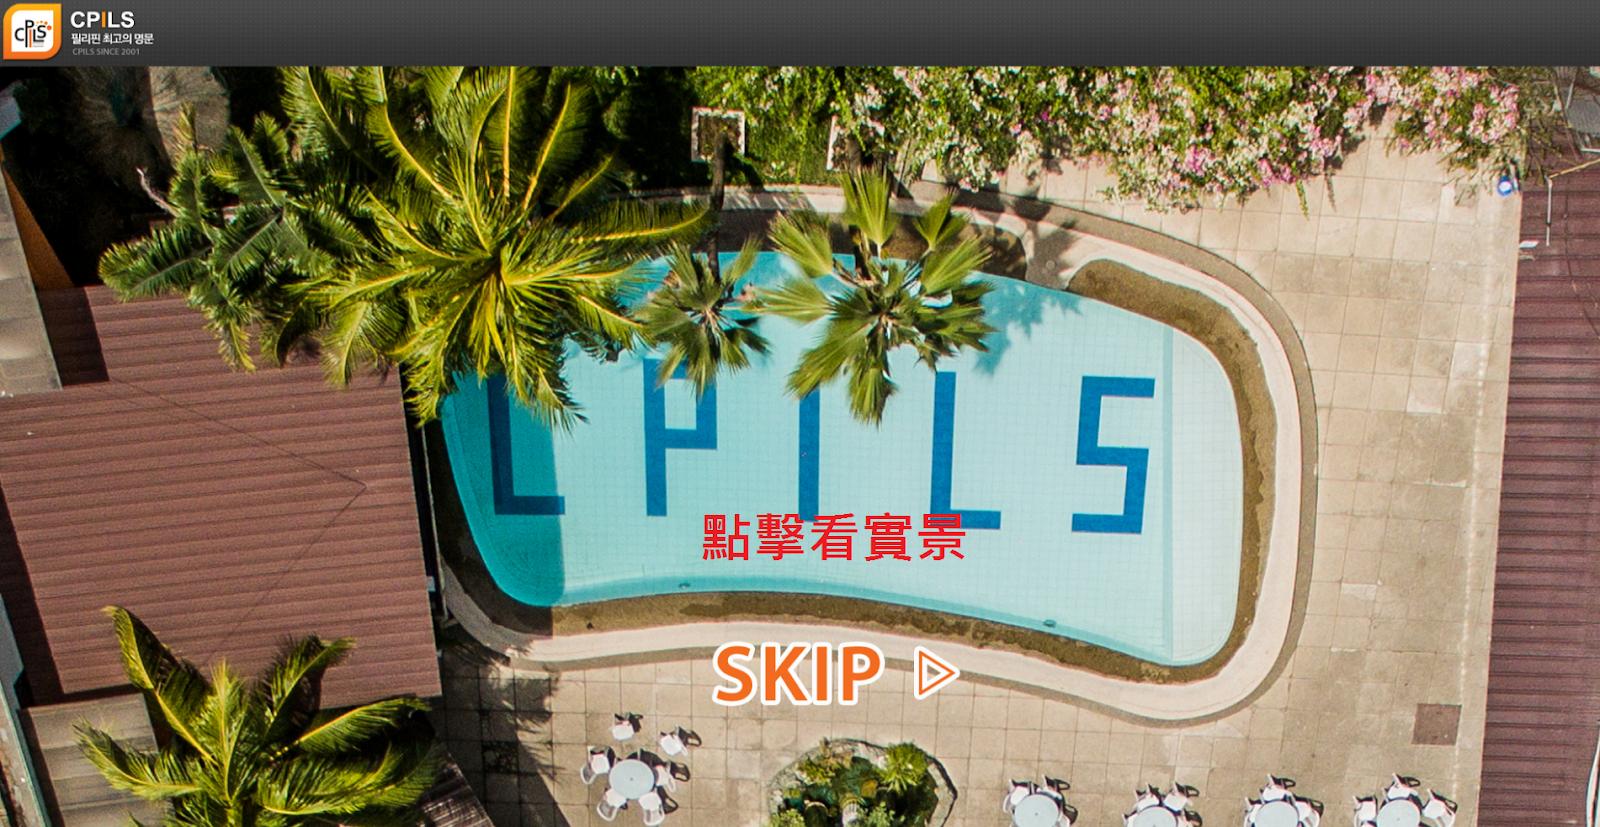 3D CPILS.png